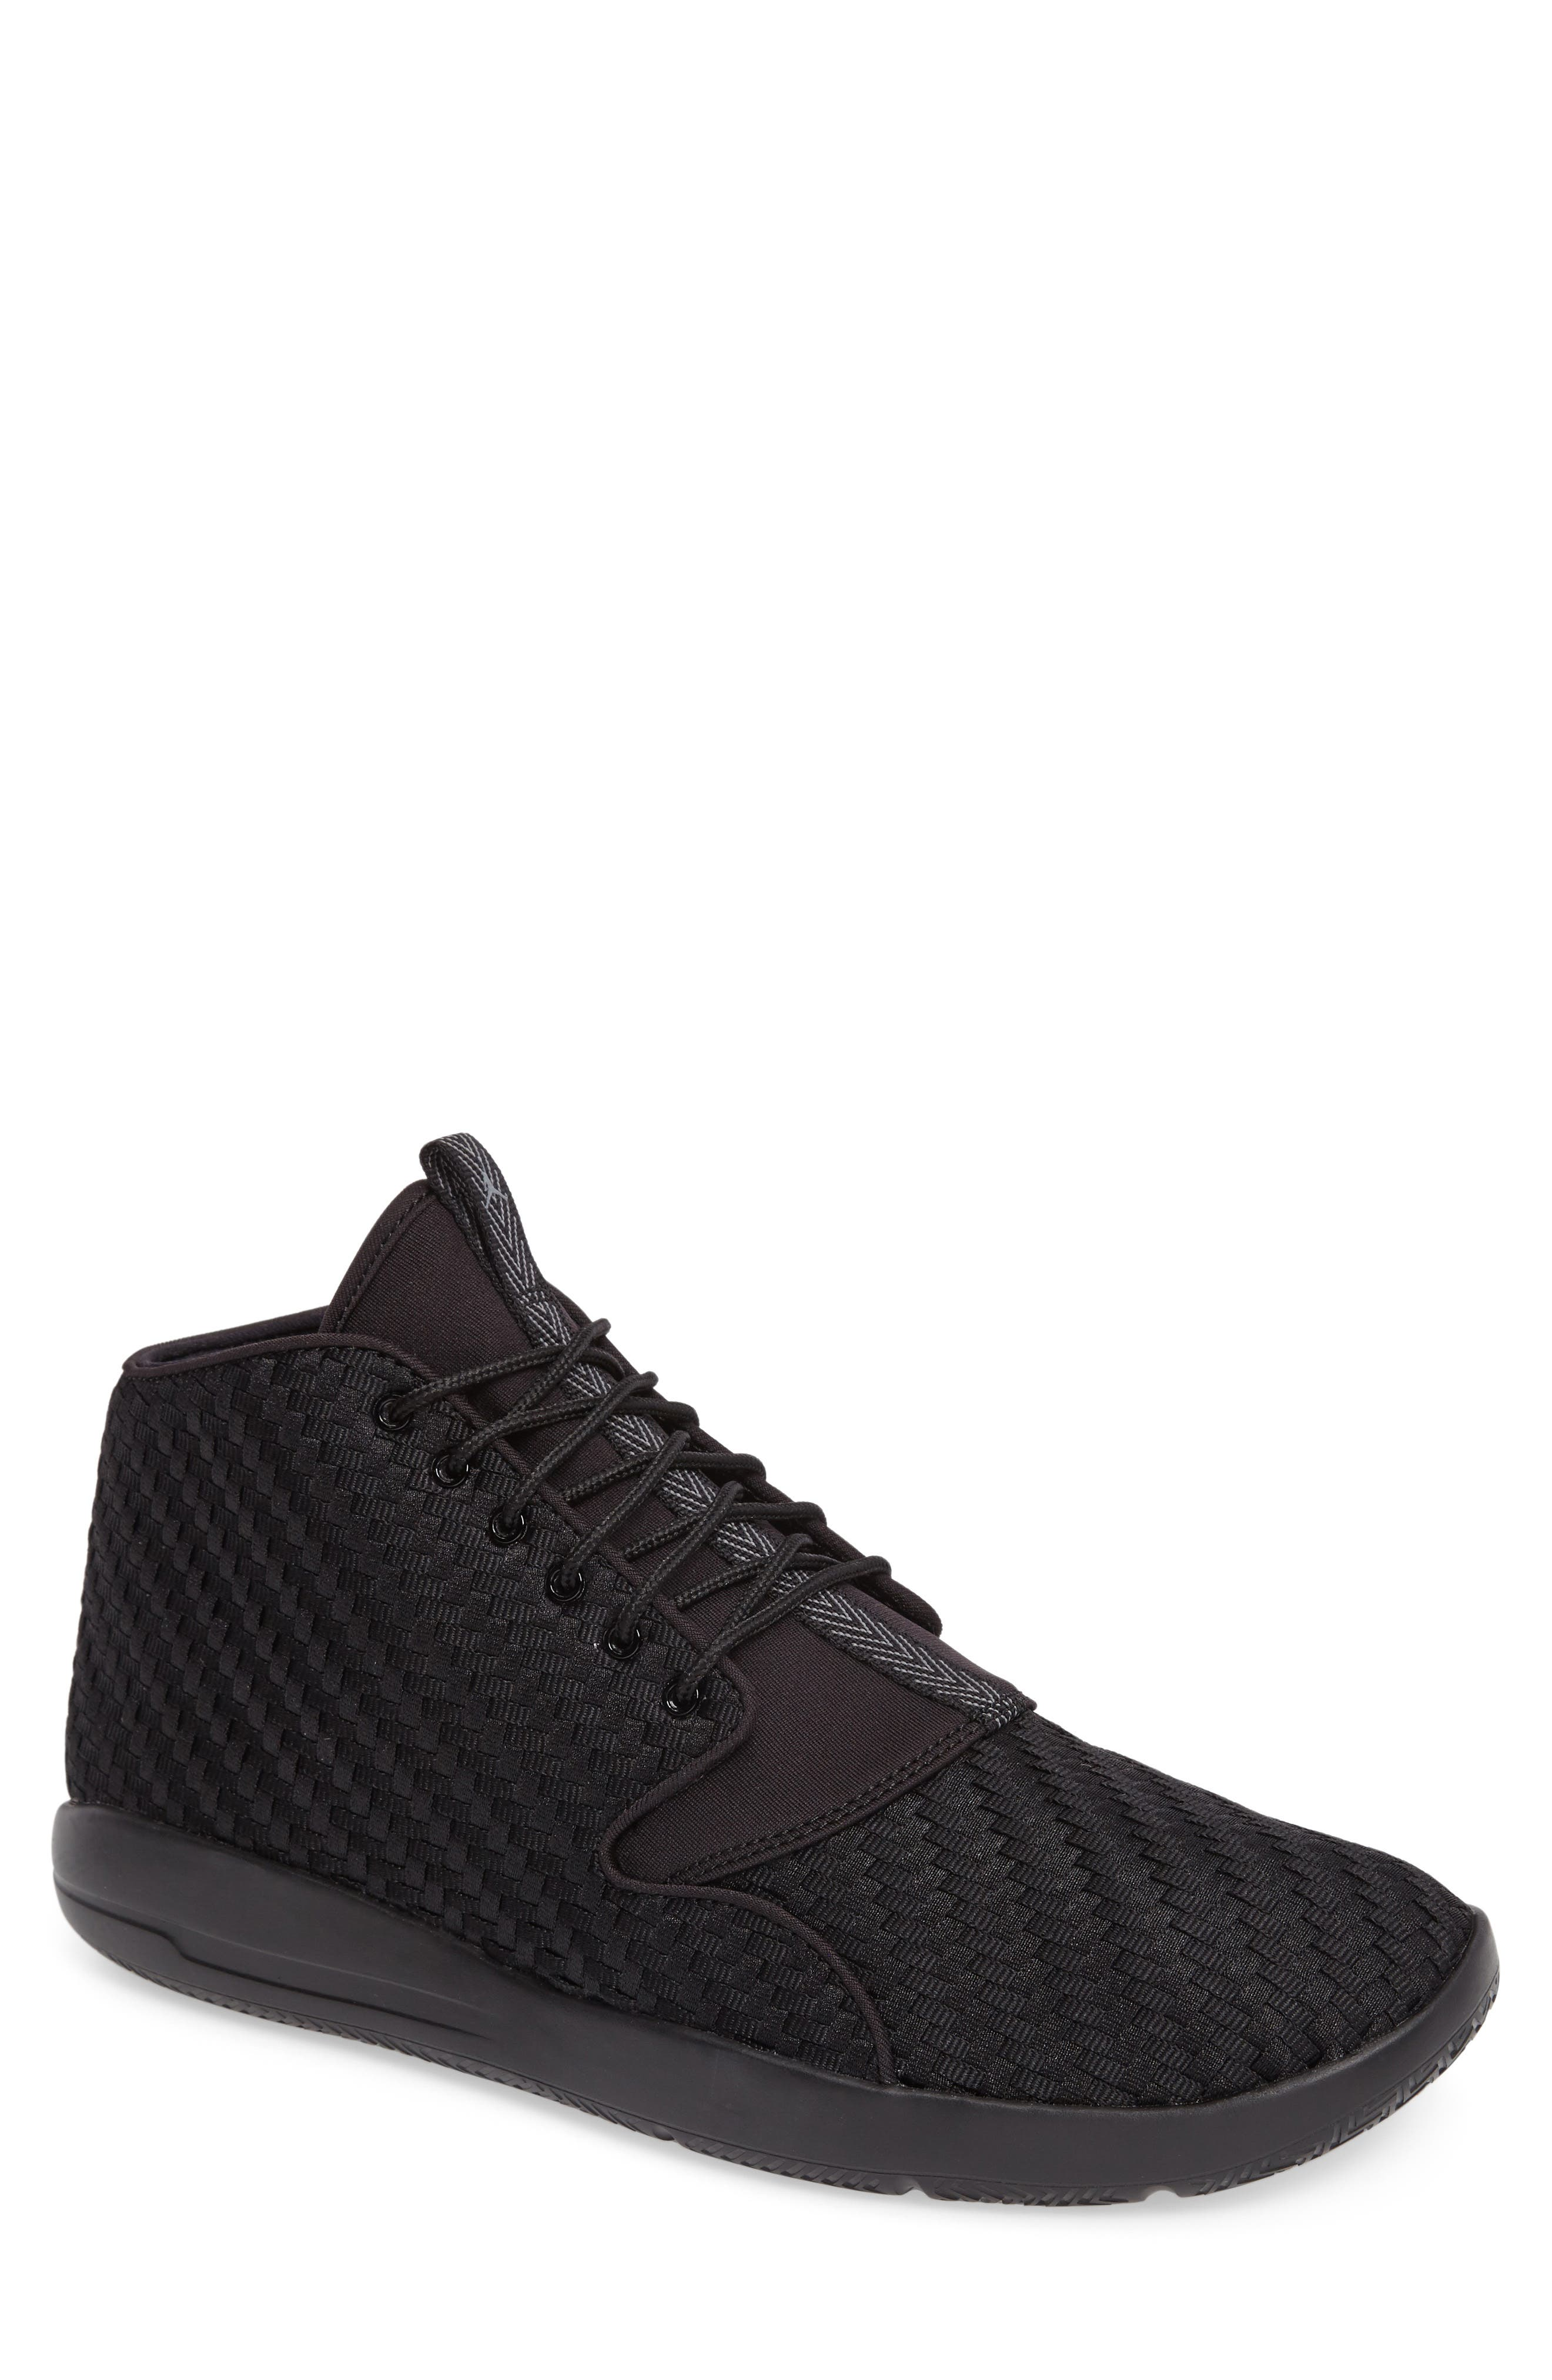 Alternate Image 1 Selected - Nike Jordan Eclipse Woven Chukka Sneaker (Men)